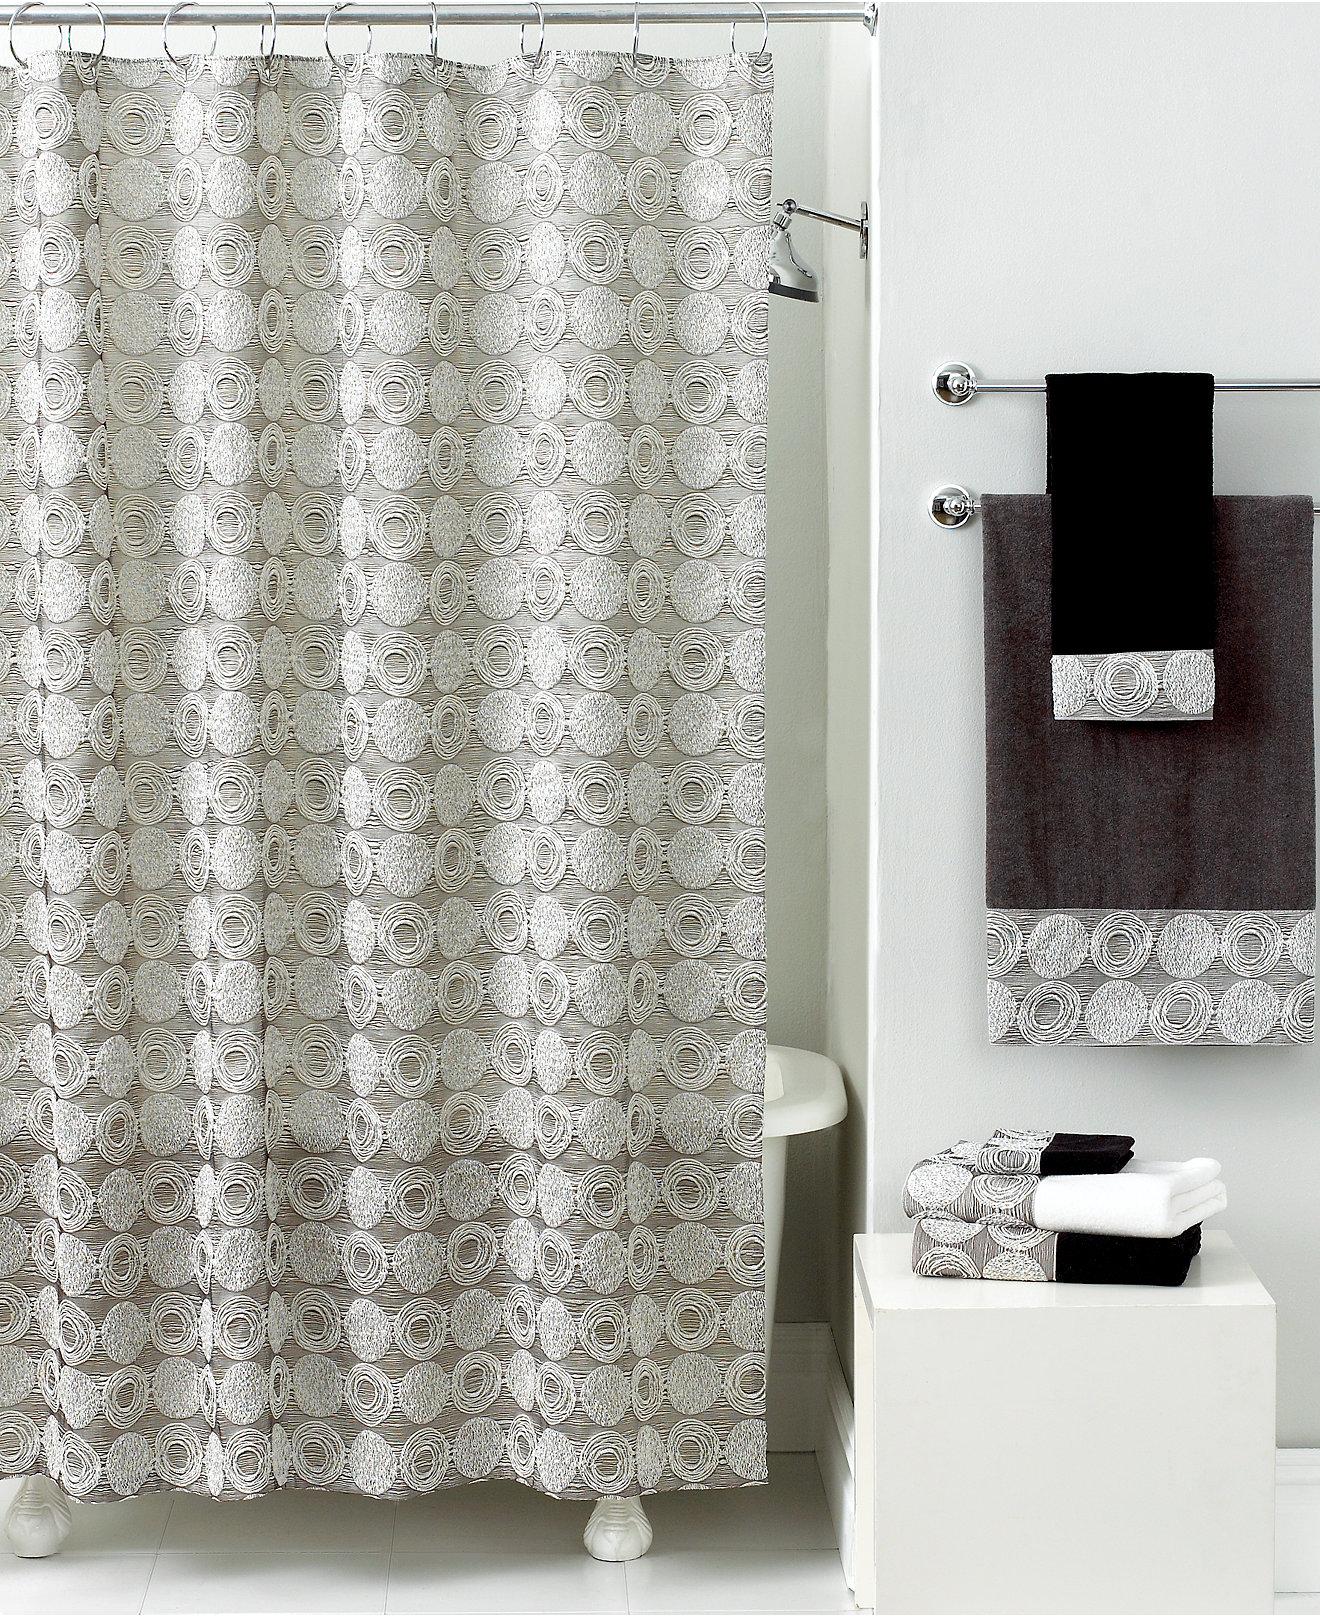 Chevron bathroom sets with shower curtain and rugs - Avanti Bath Galaxy Collection Bathroom Accessories Bed Bath Macy S